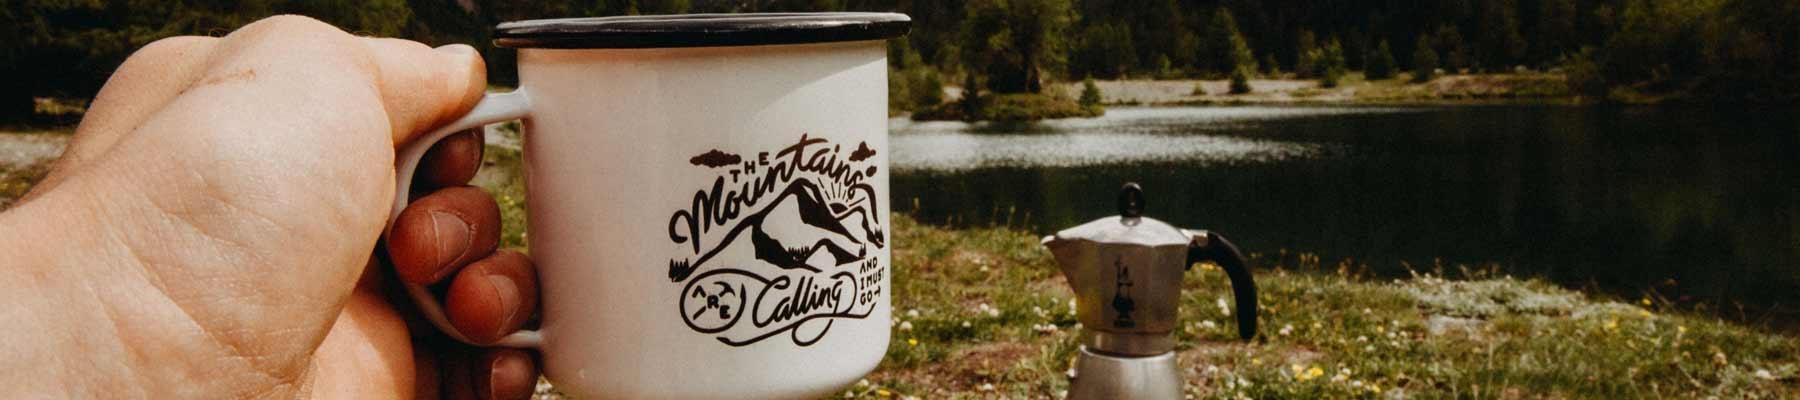 Kaffee Tasse Camping